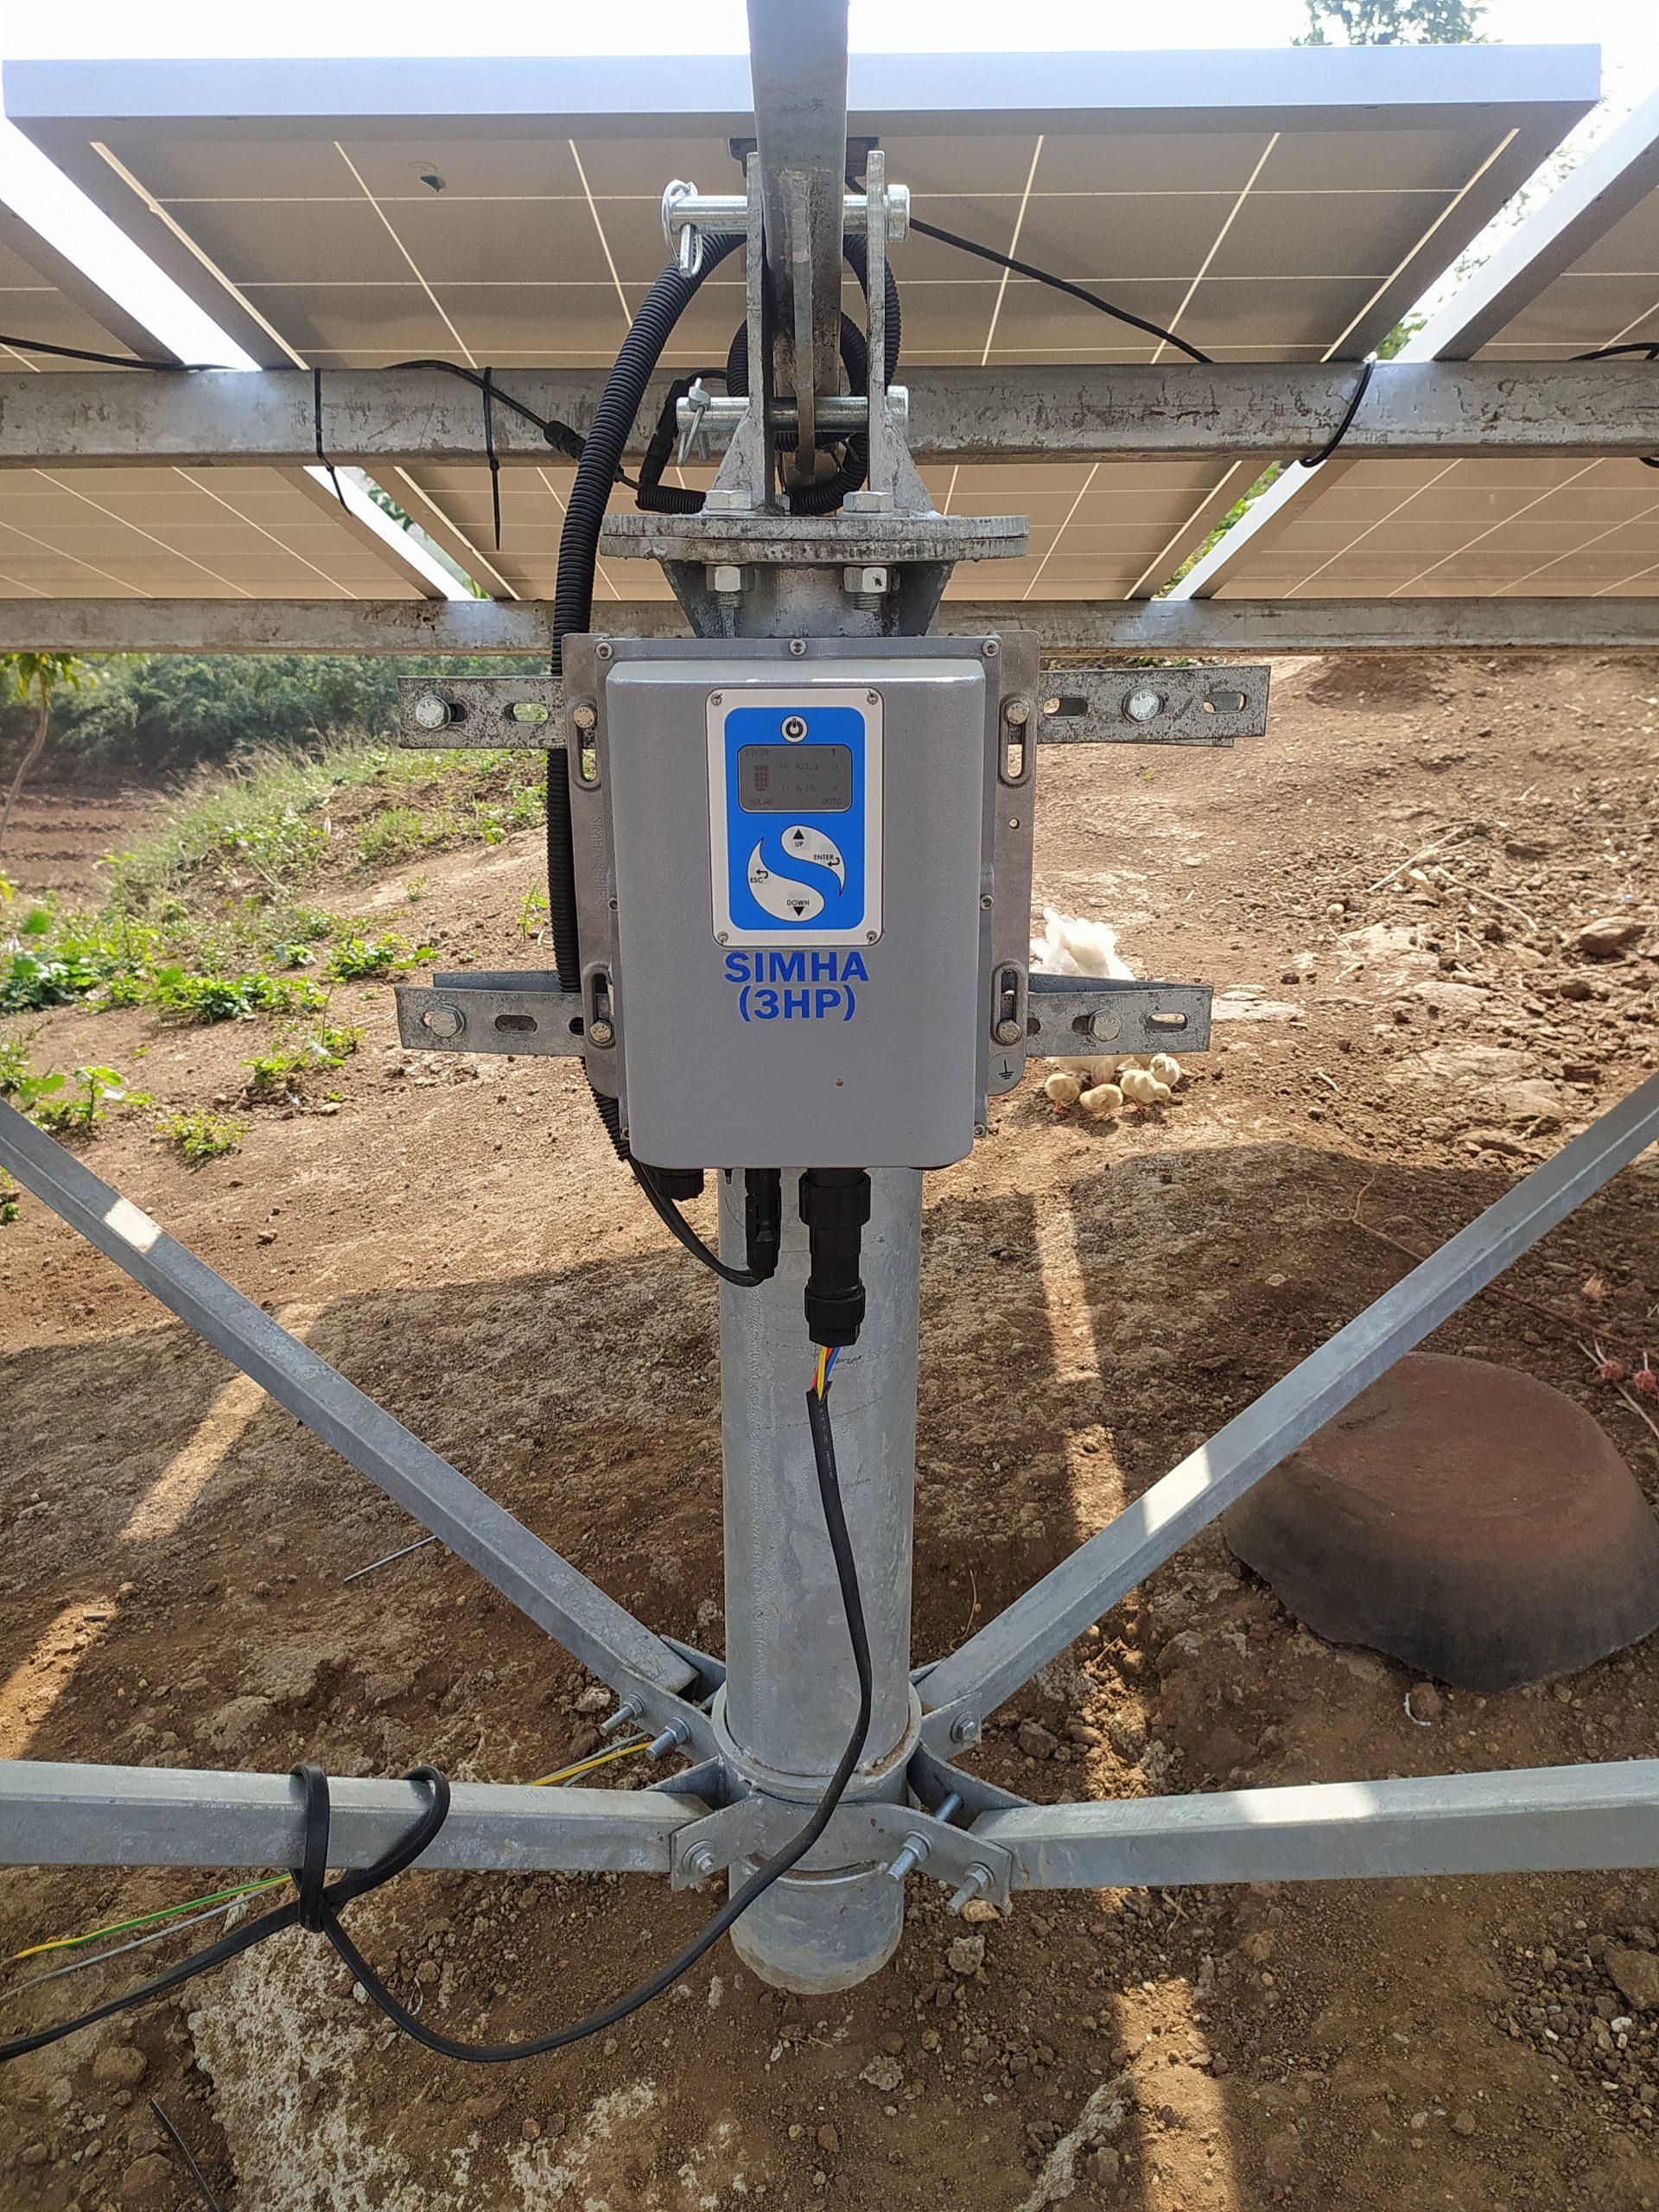 Solar panel machine